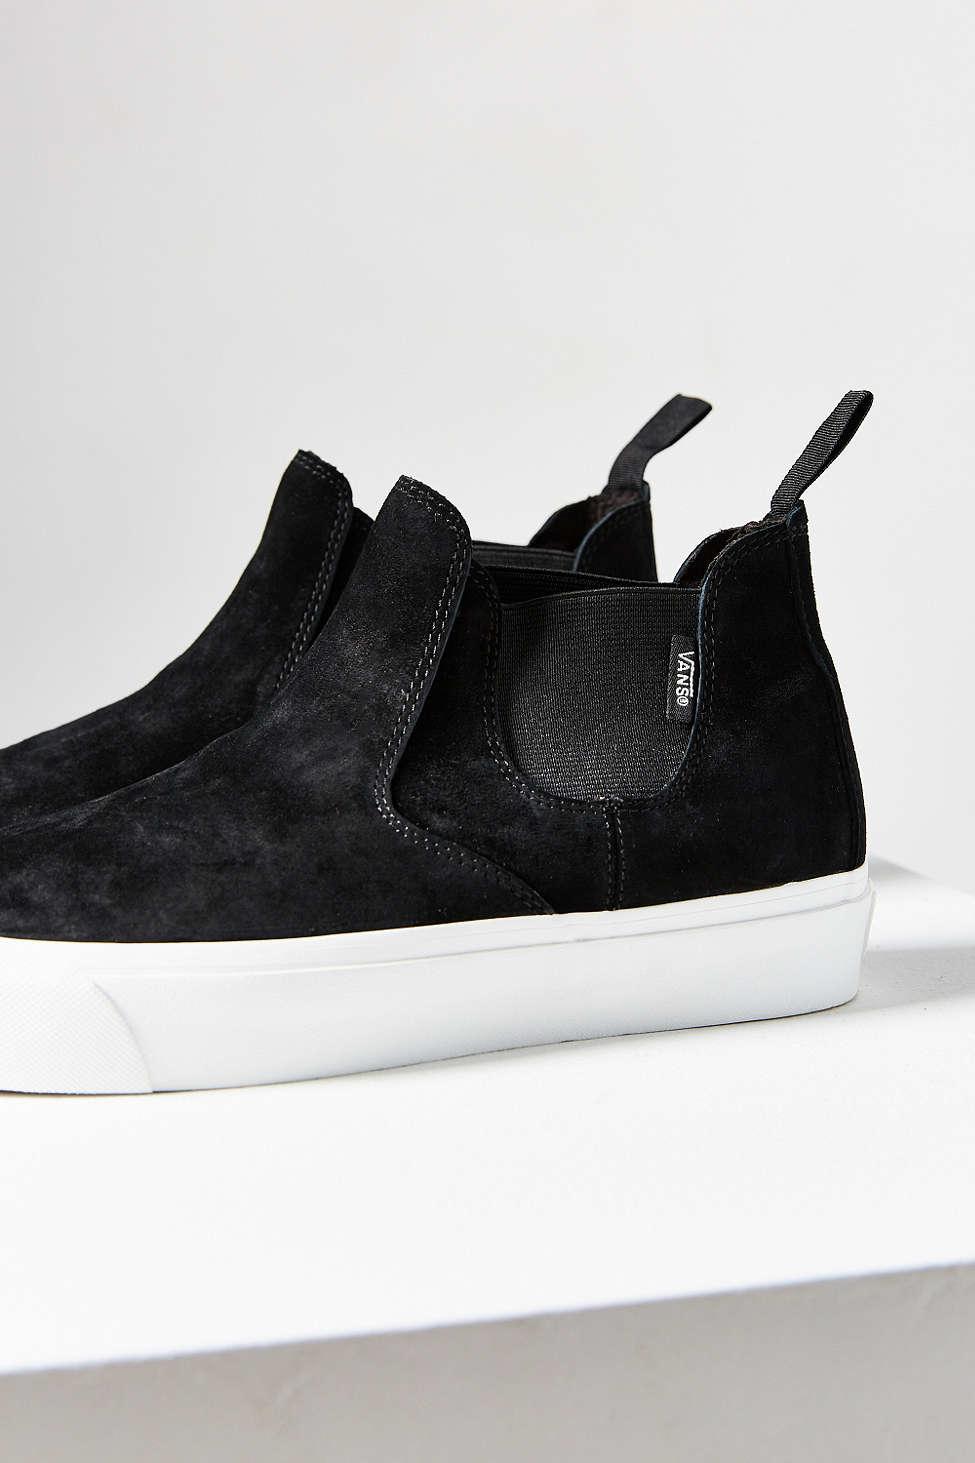 Lyst - Vans Scotchgard Slip-on Mid Dx Sneaker in Black 1996b17f6